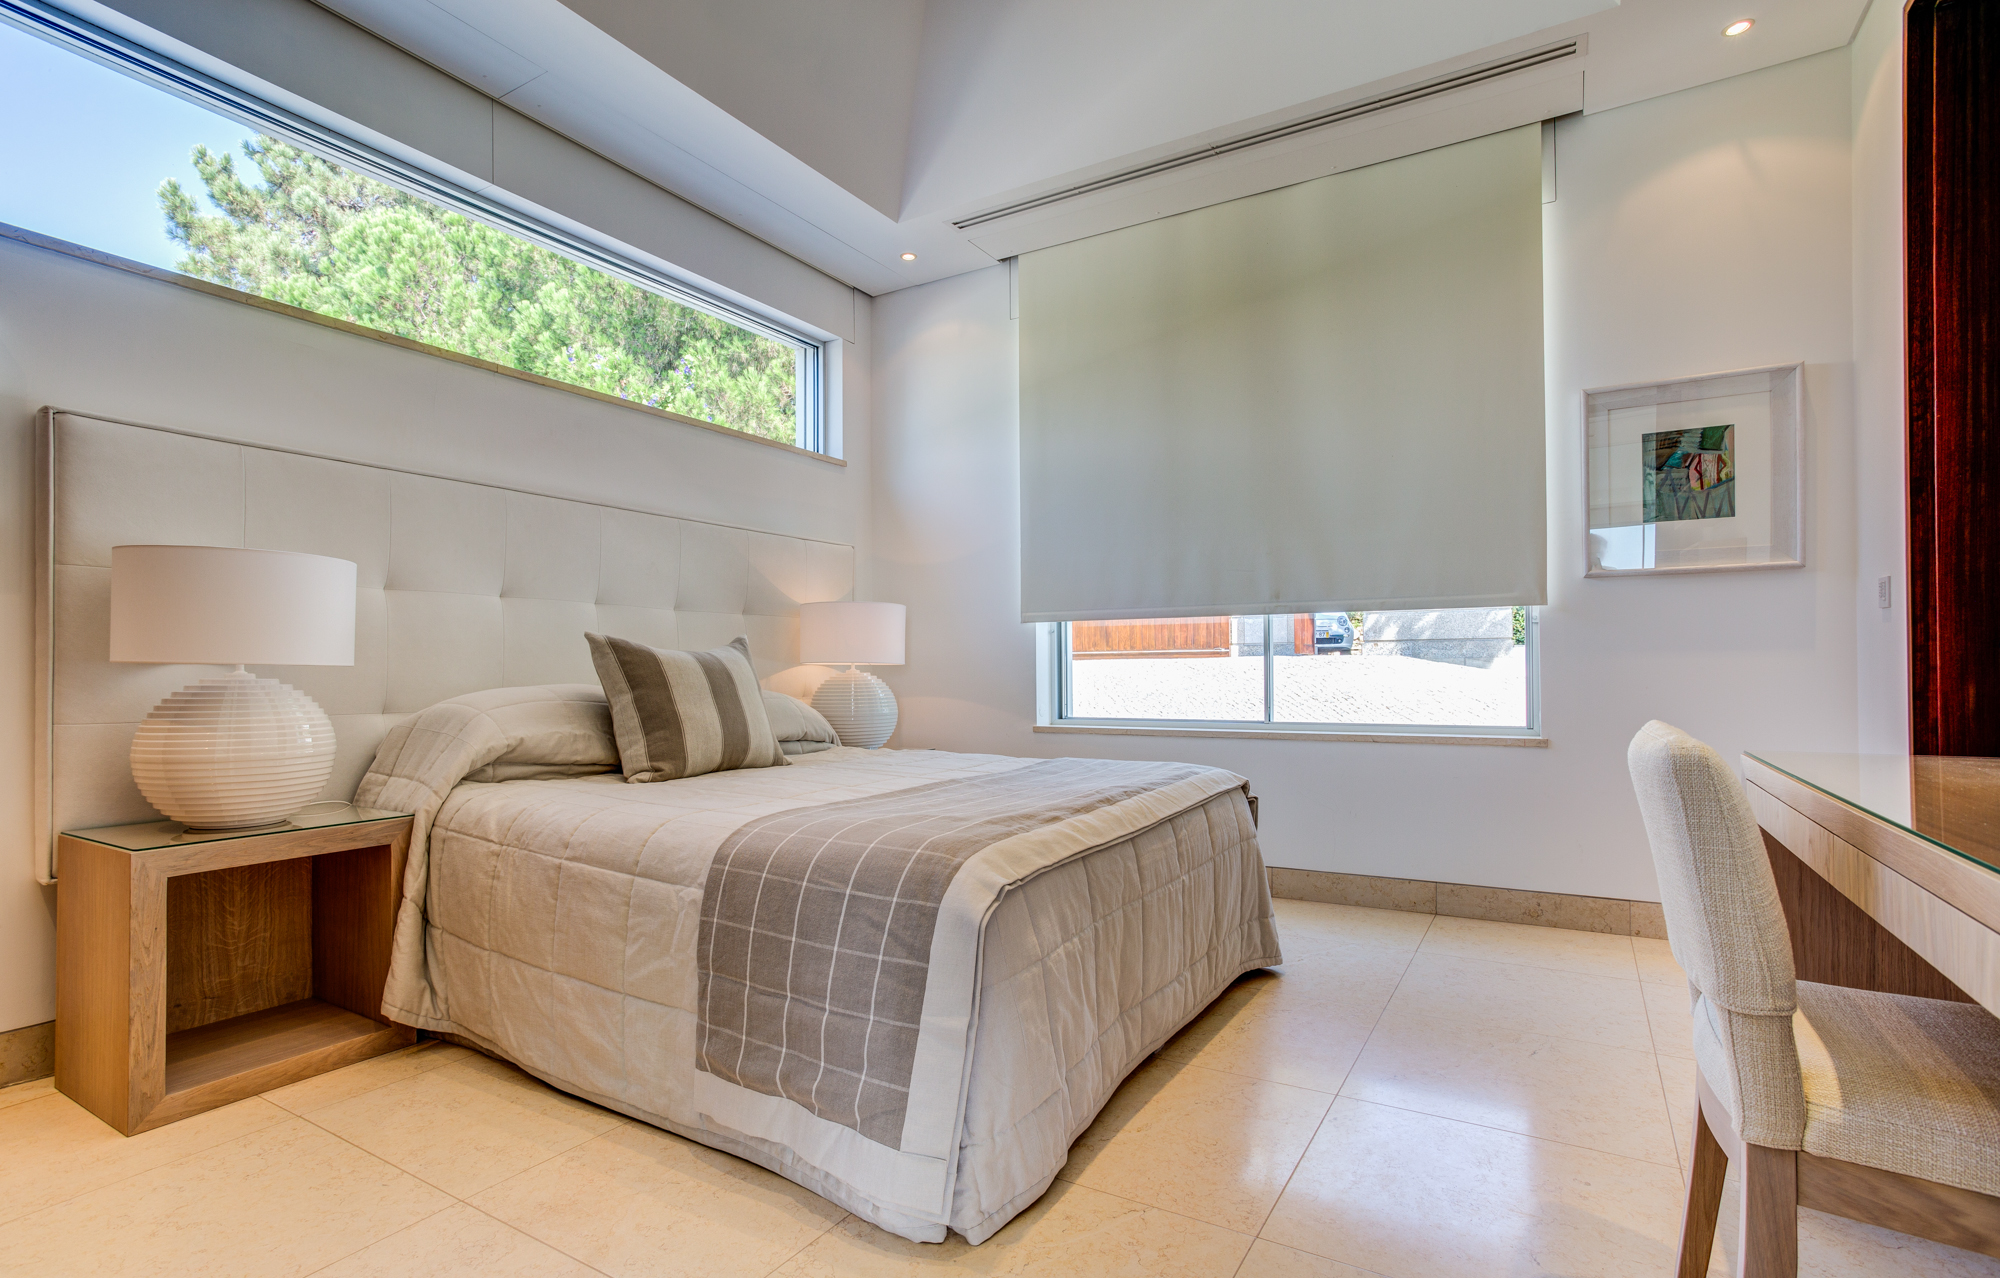 Villa Moon Sone, 5 bedroom prestige villa in Quinta do Lago, Algarve,bedroom 4.jpg